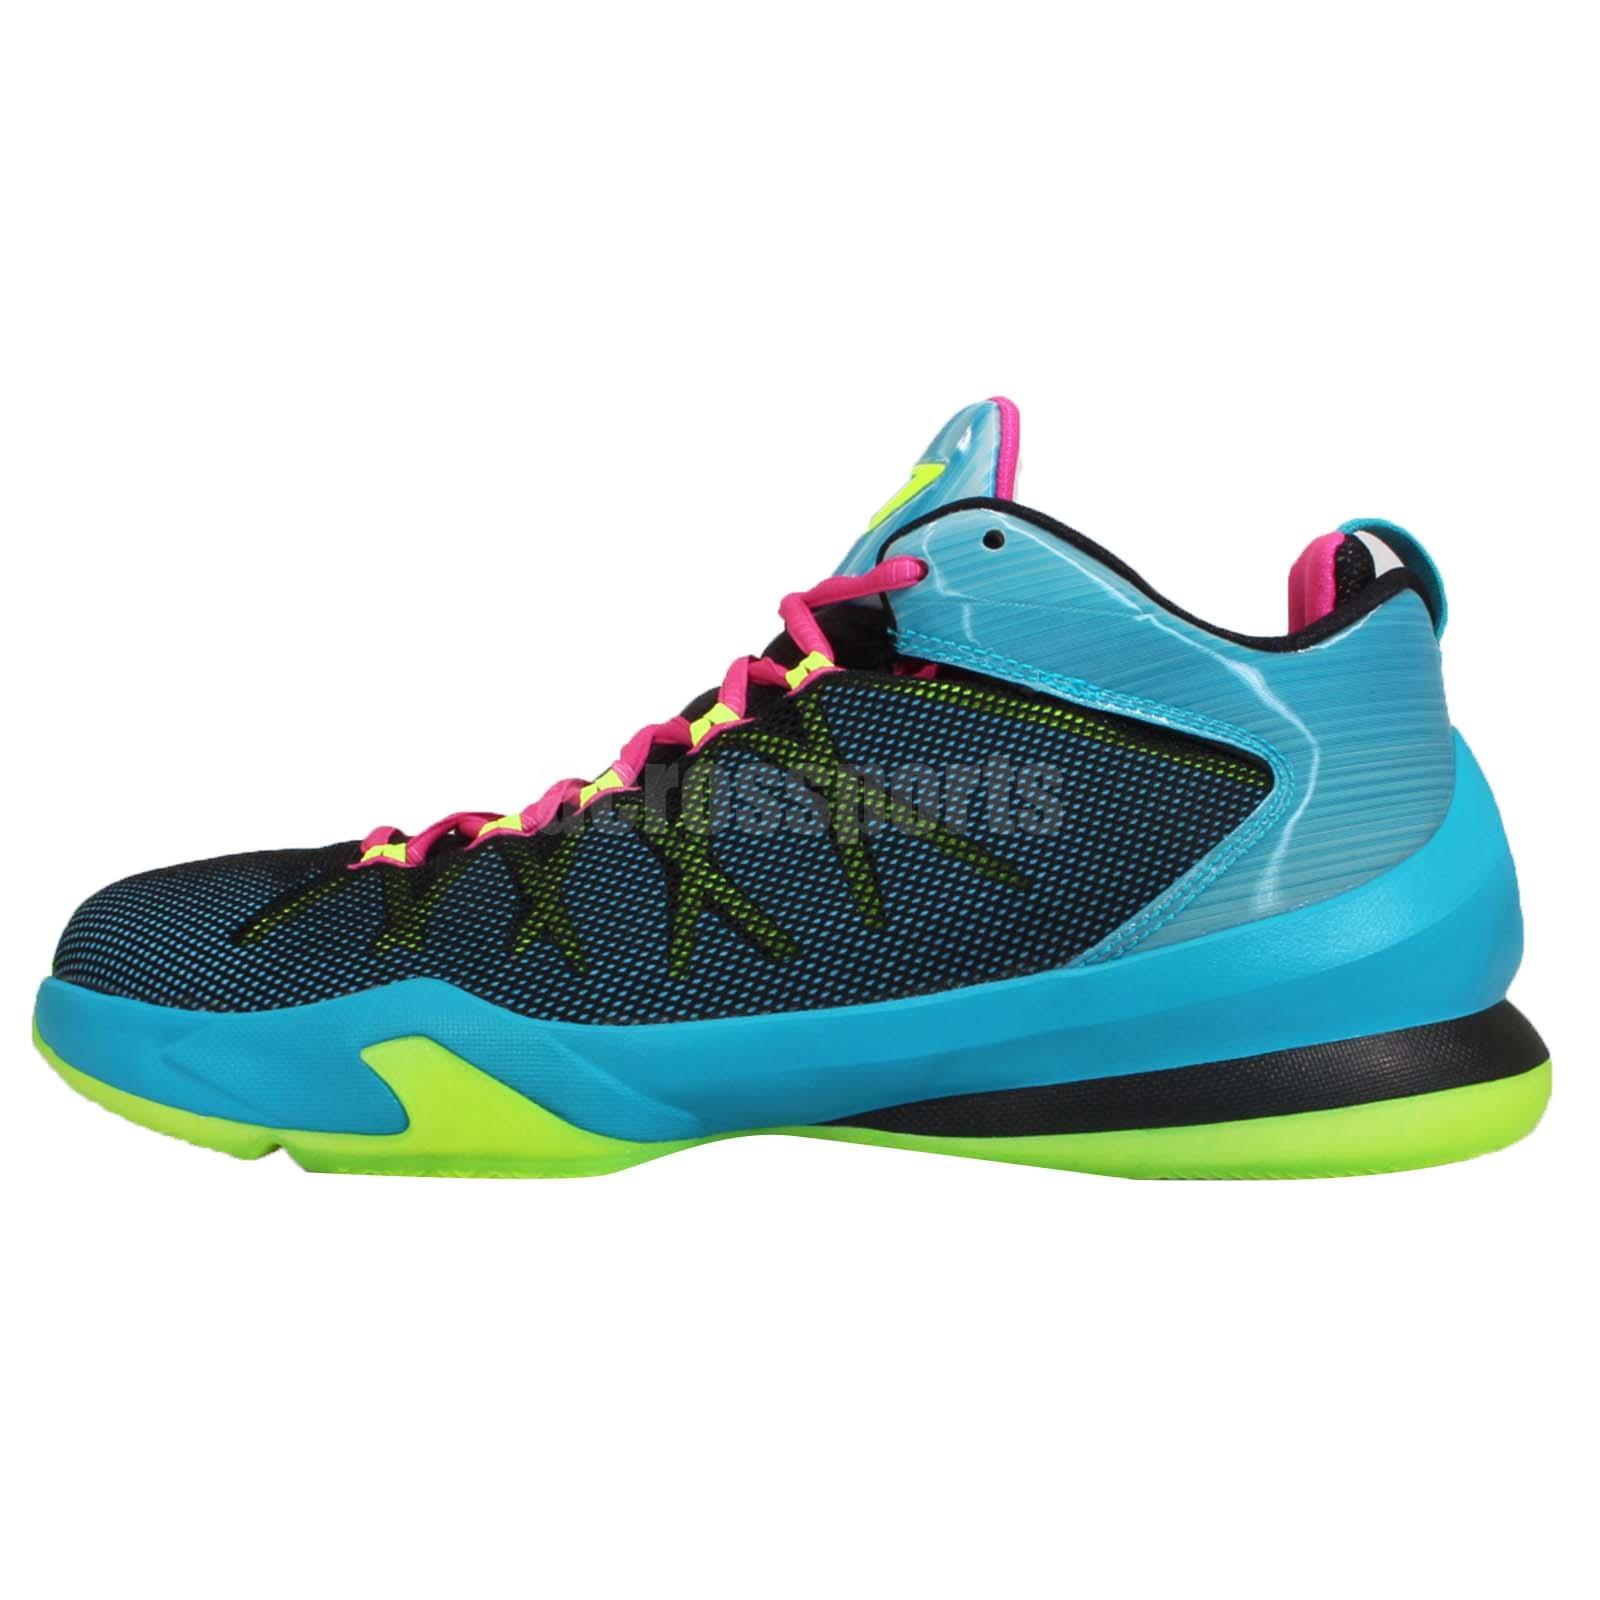 nike id personnaliser Hyperdunks - Nike Jordan CP3. VIII AE 8 Chris Paul Blue Pink Mens Basketball ...